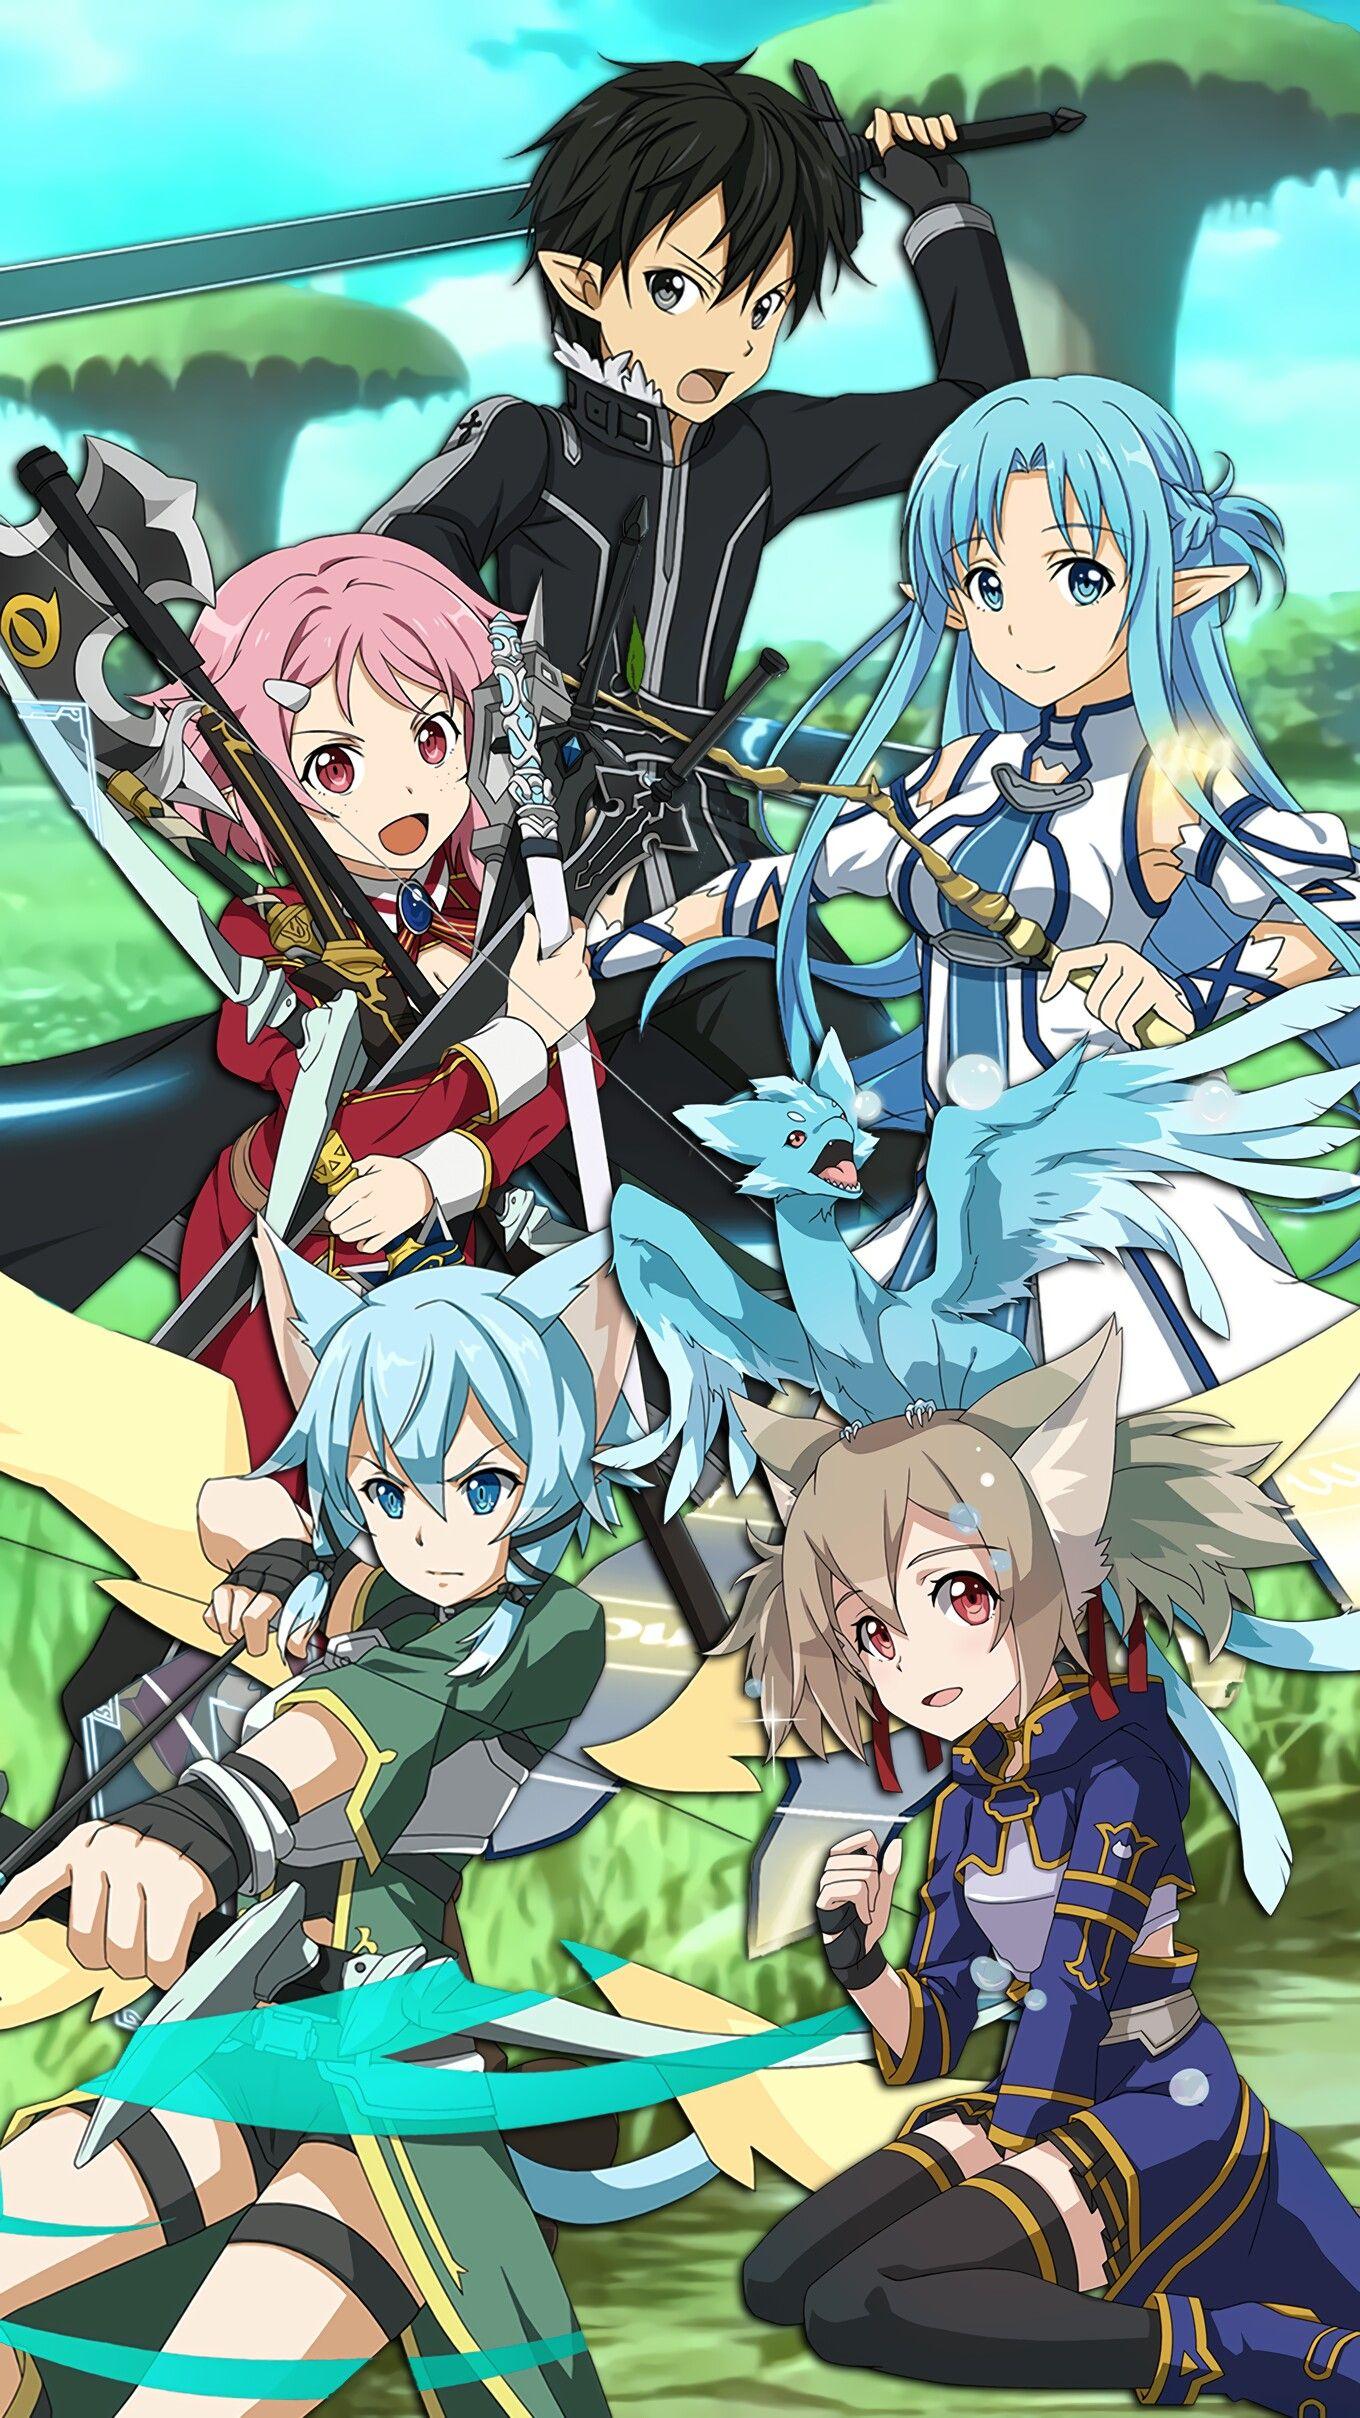 Free Download Alo Sword Art Online Wallpaper Kirito Lizbeth Asuna